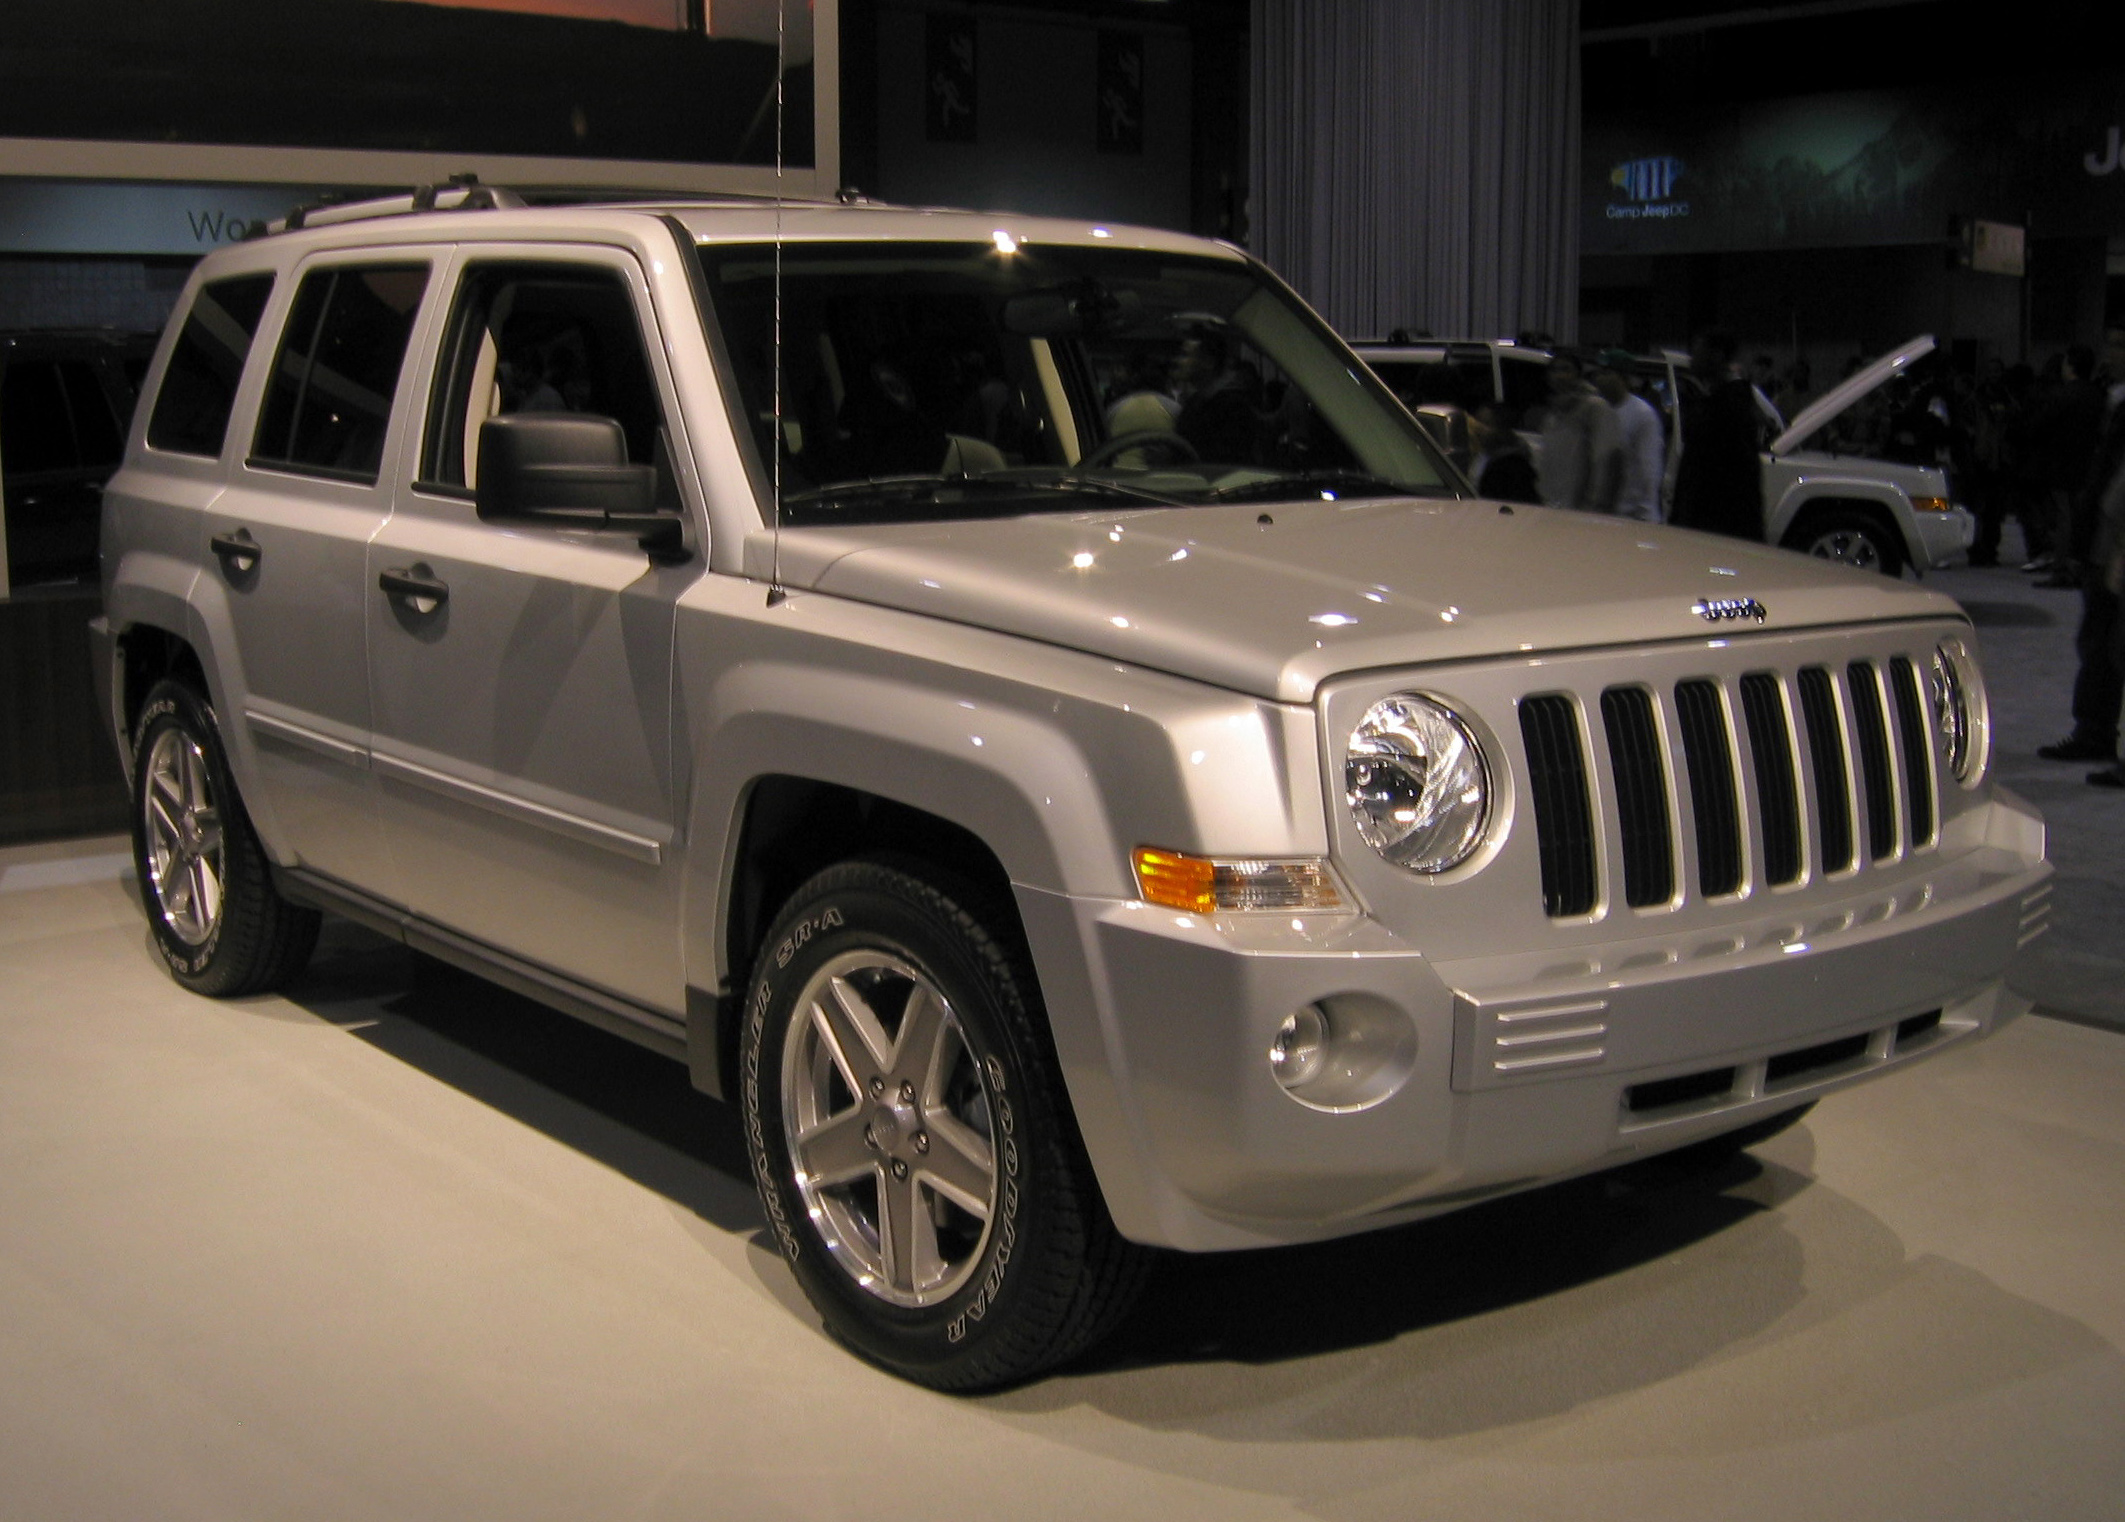 Jeep Patriot 2.4